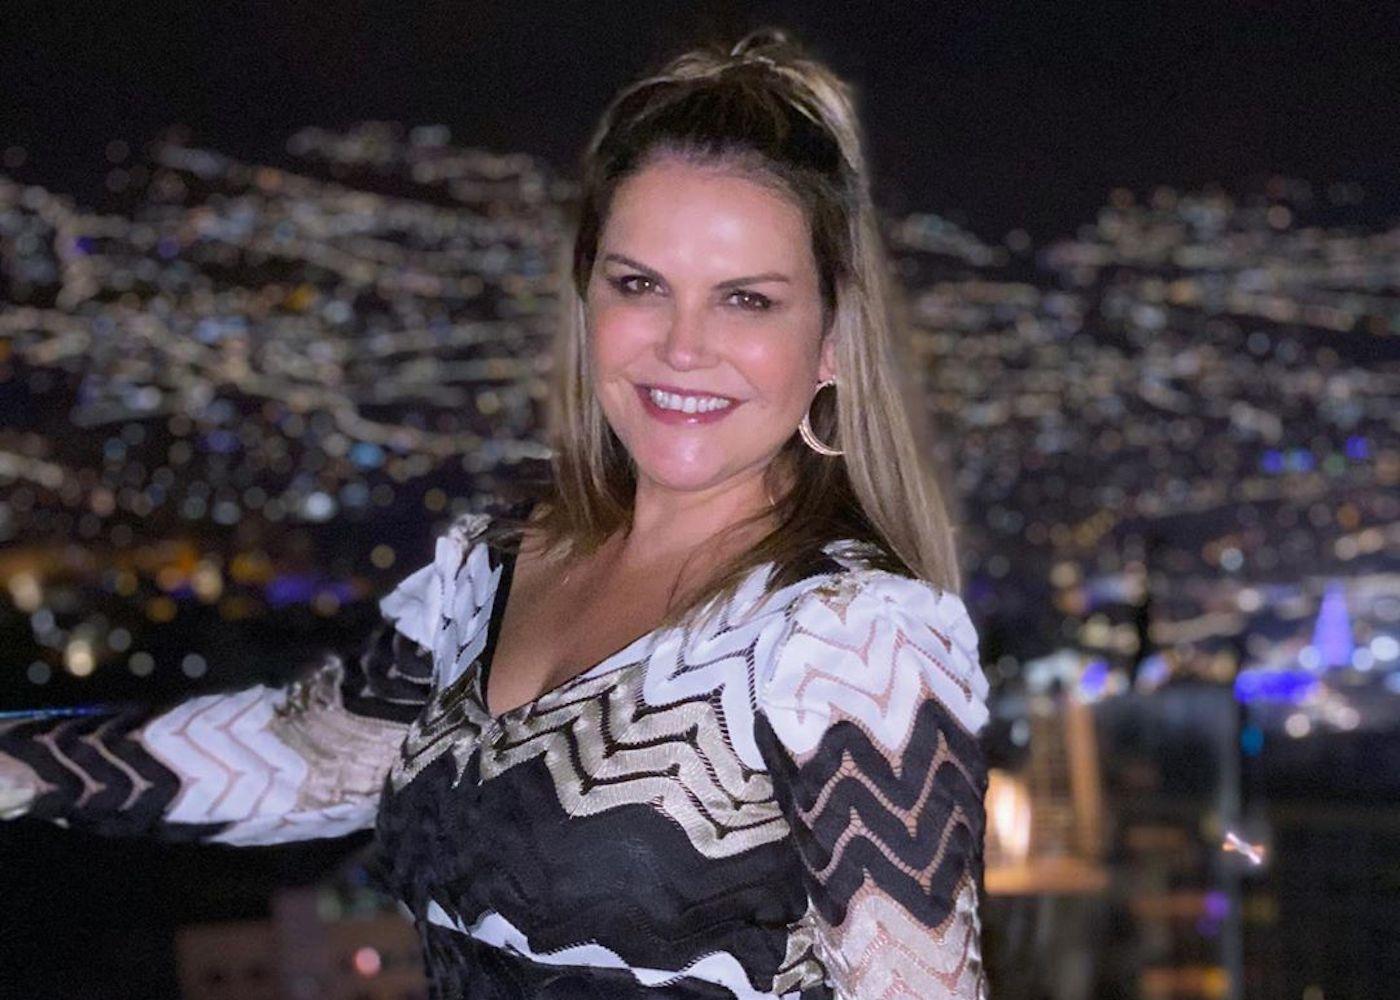 Katia Aveiro 1 Katia Aveiro Mostra Momento Especial: &Quot;Toda A Minha Vida Está Neste Vídeo&Quot;